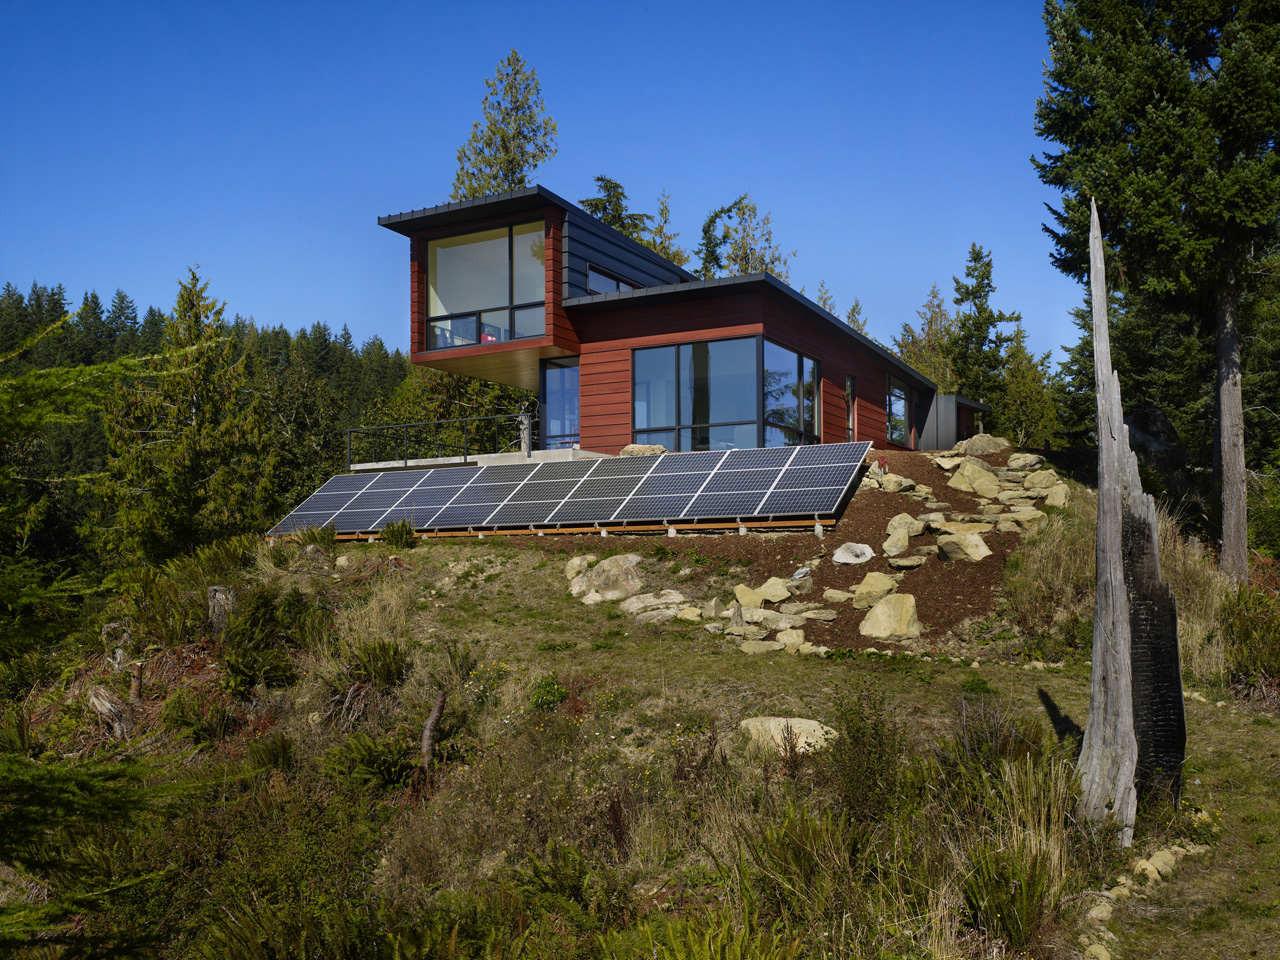 Chuckanut Ridge Residence / Prentiss Architects, © Ben Benschneider